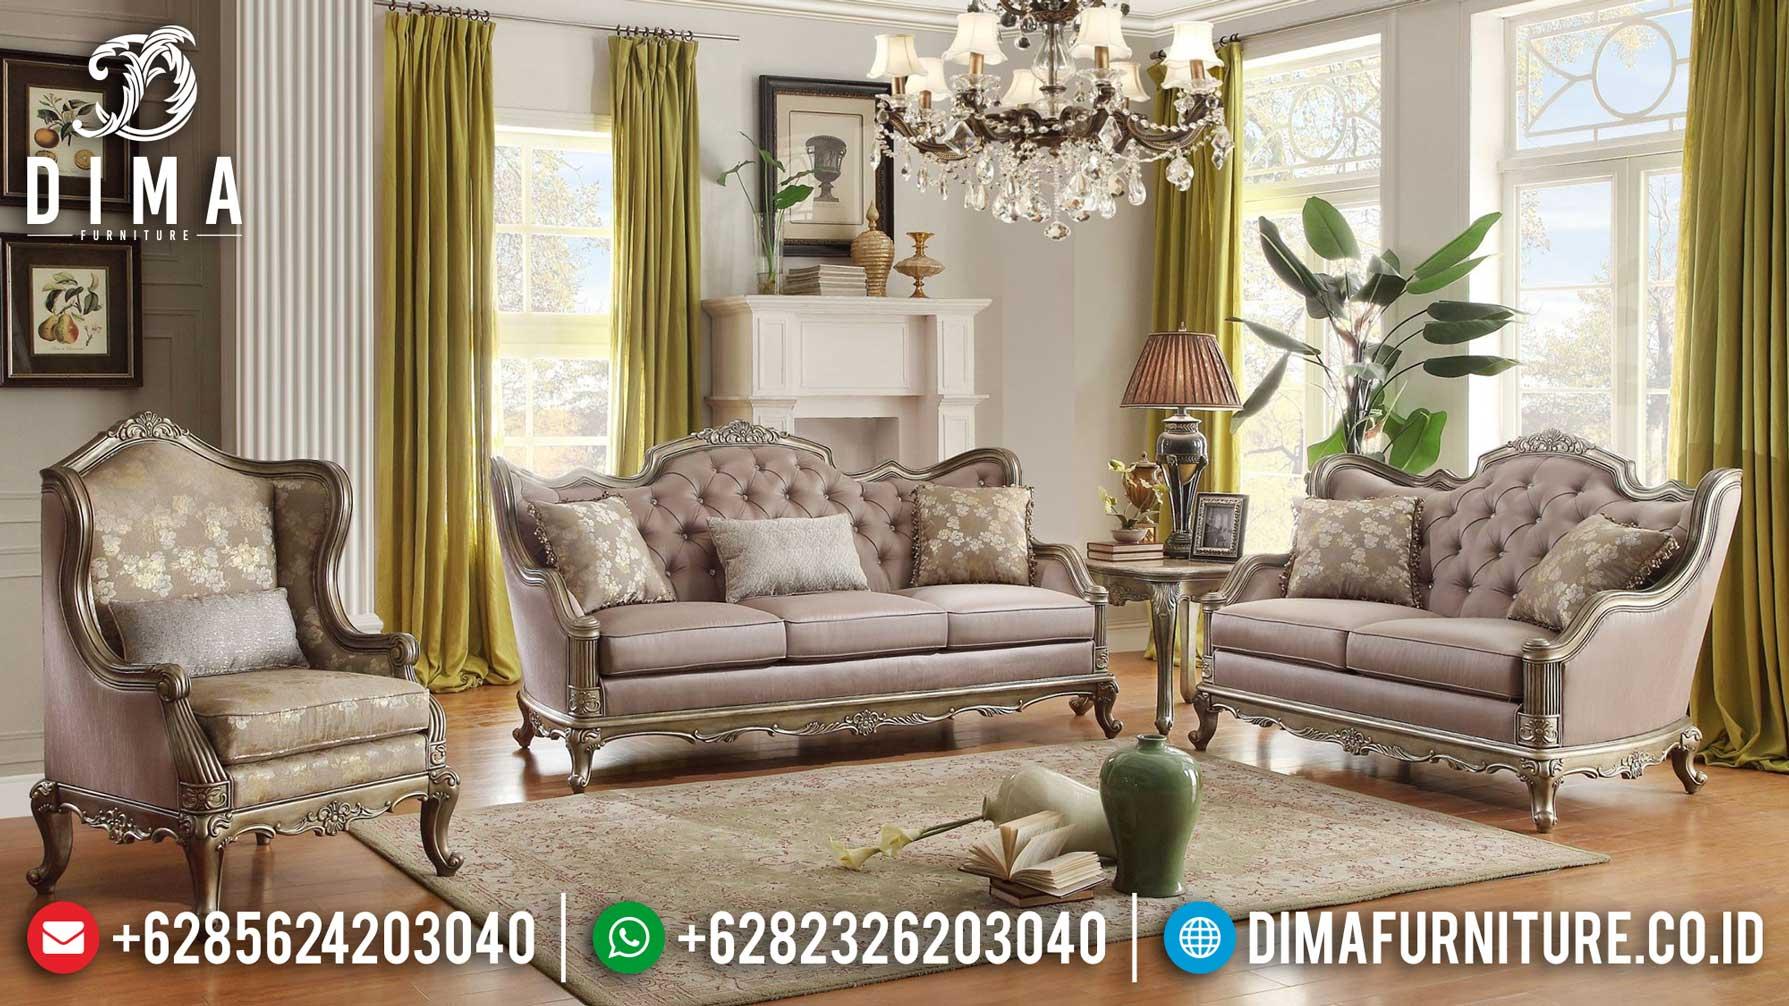 Inspiring Design Sofa Tamu Mewah Jepara Luxury Royal Carving Great Quality TTJ-1238